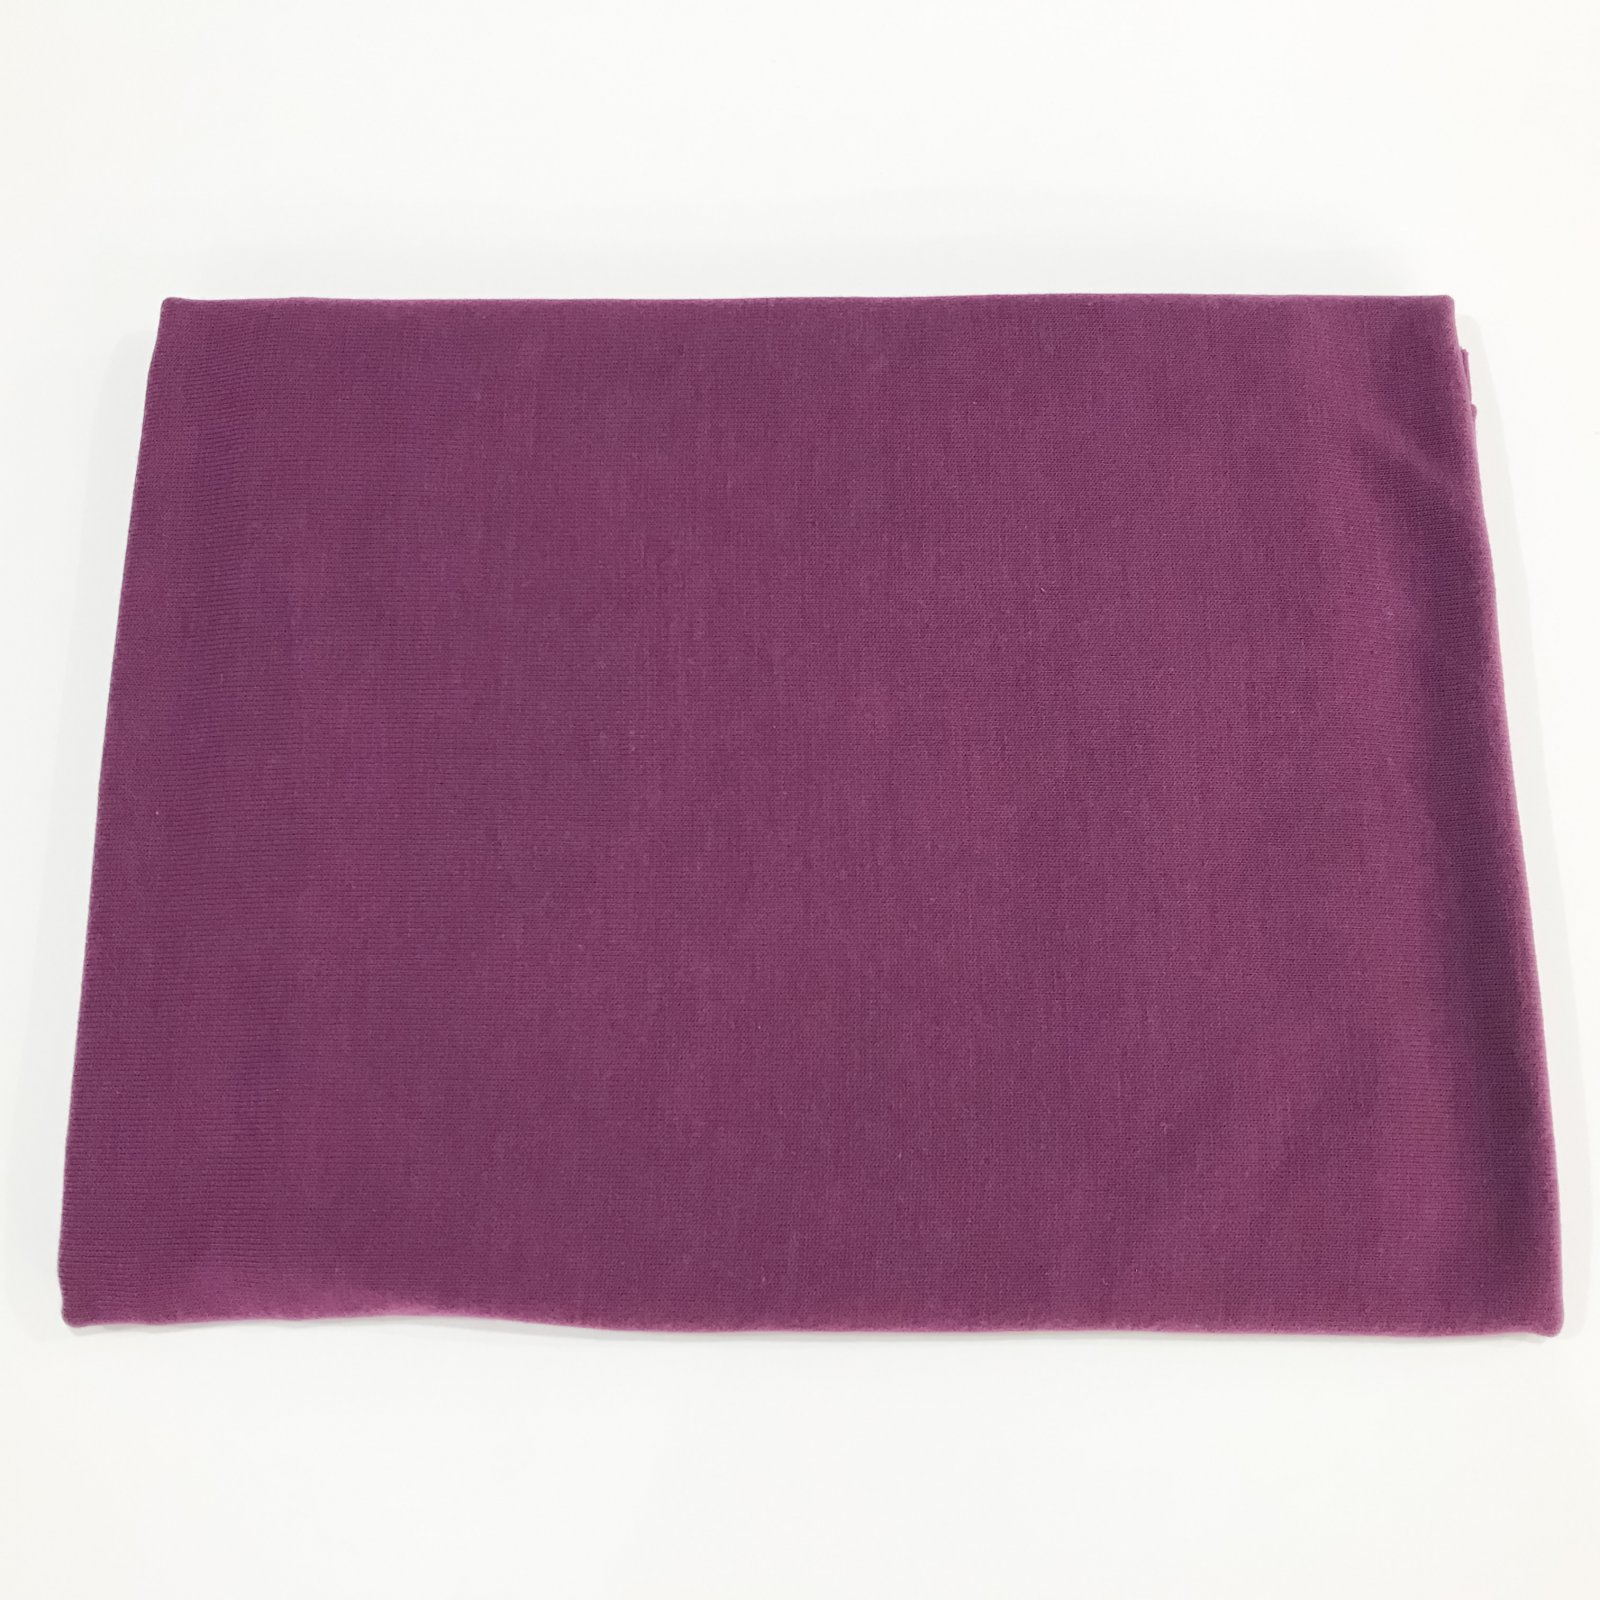 1 yard - Hacci Sweater Knit - Deep Plum